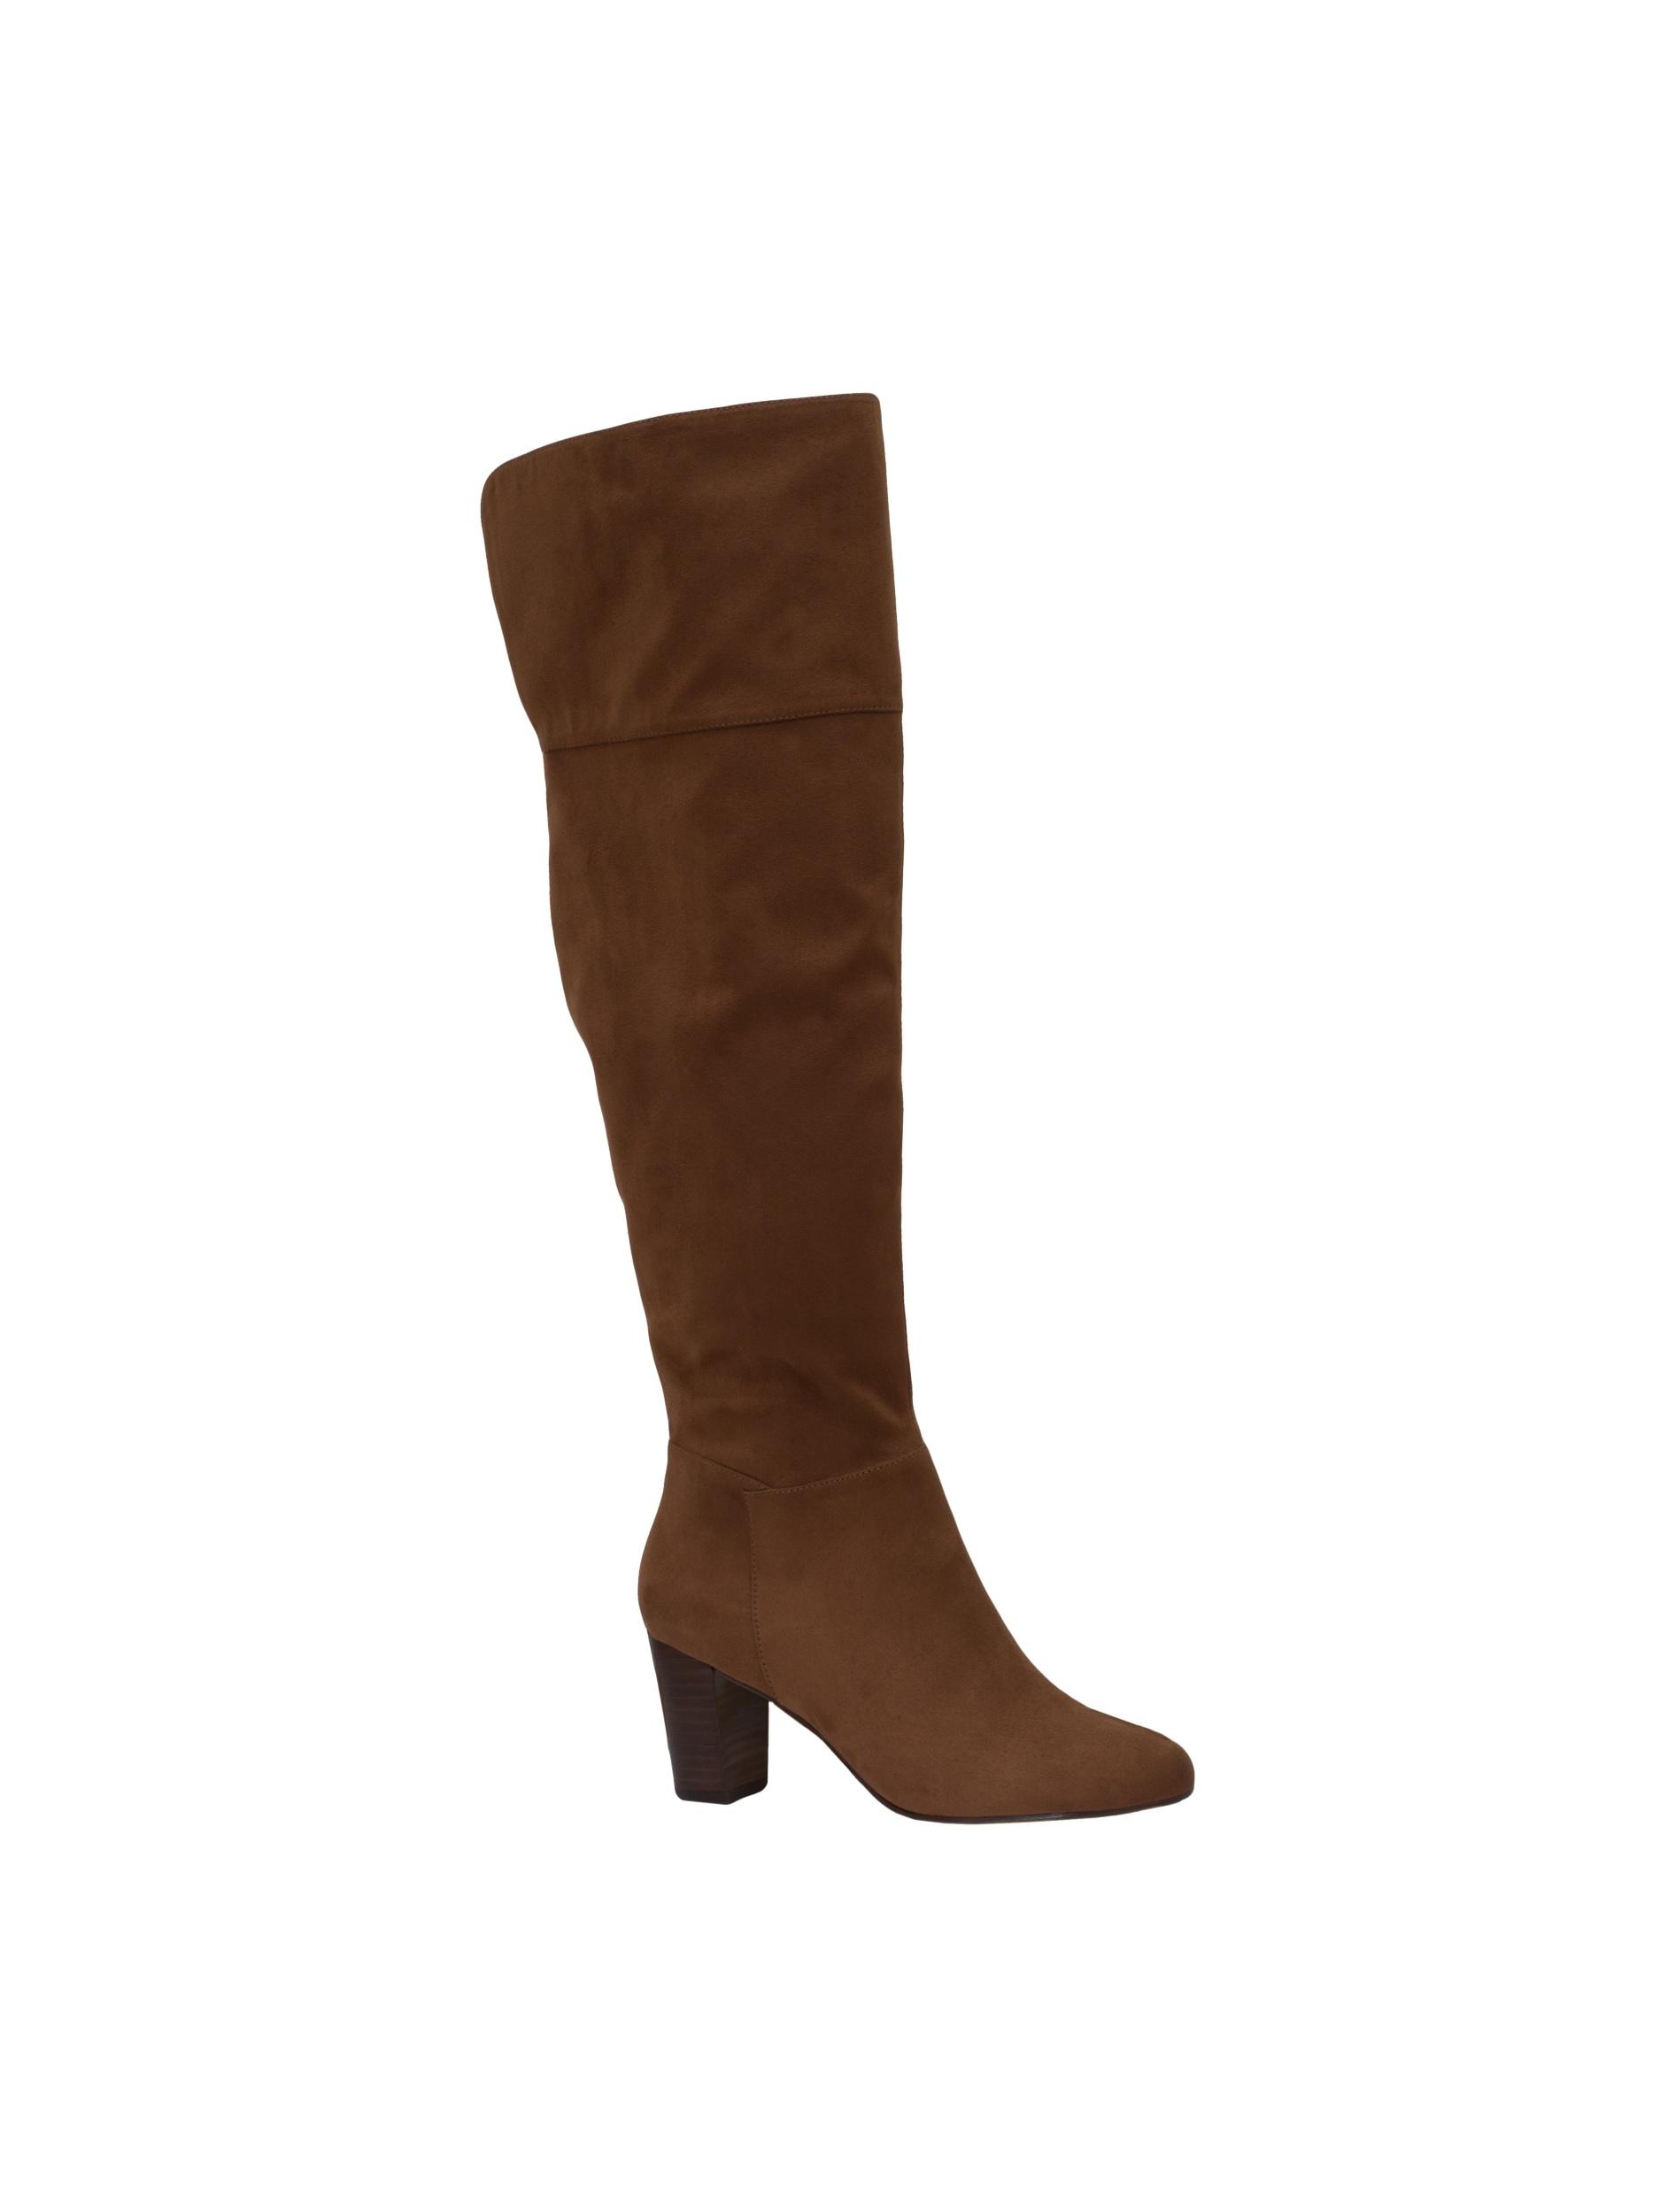 Bella Vita Women's Telluride II Camel Super-suede Over-the-knee Boots by Bella Vita